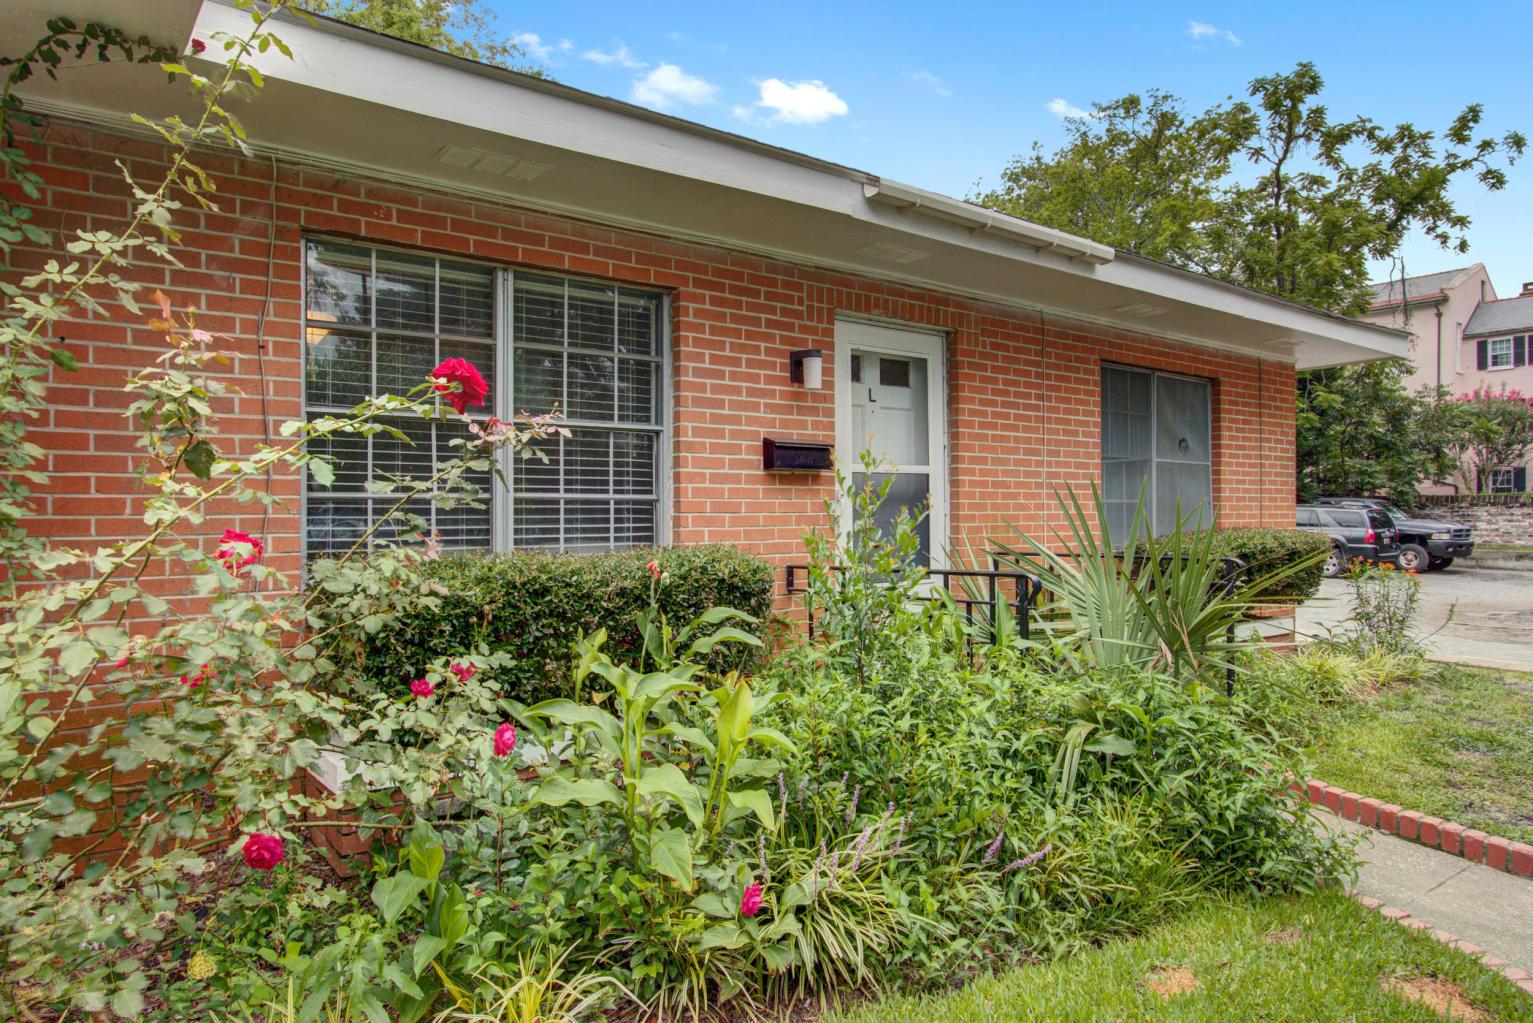 Rutledge Green Homes For Sale - 173 Rutledge, Charleston, SC - 3